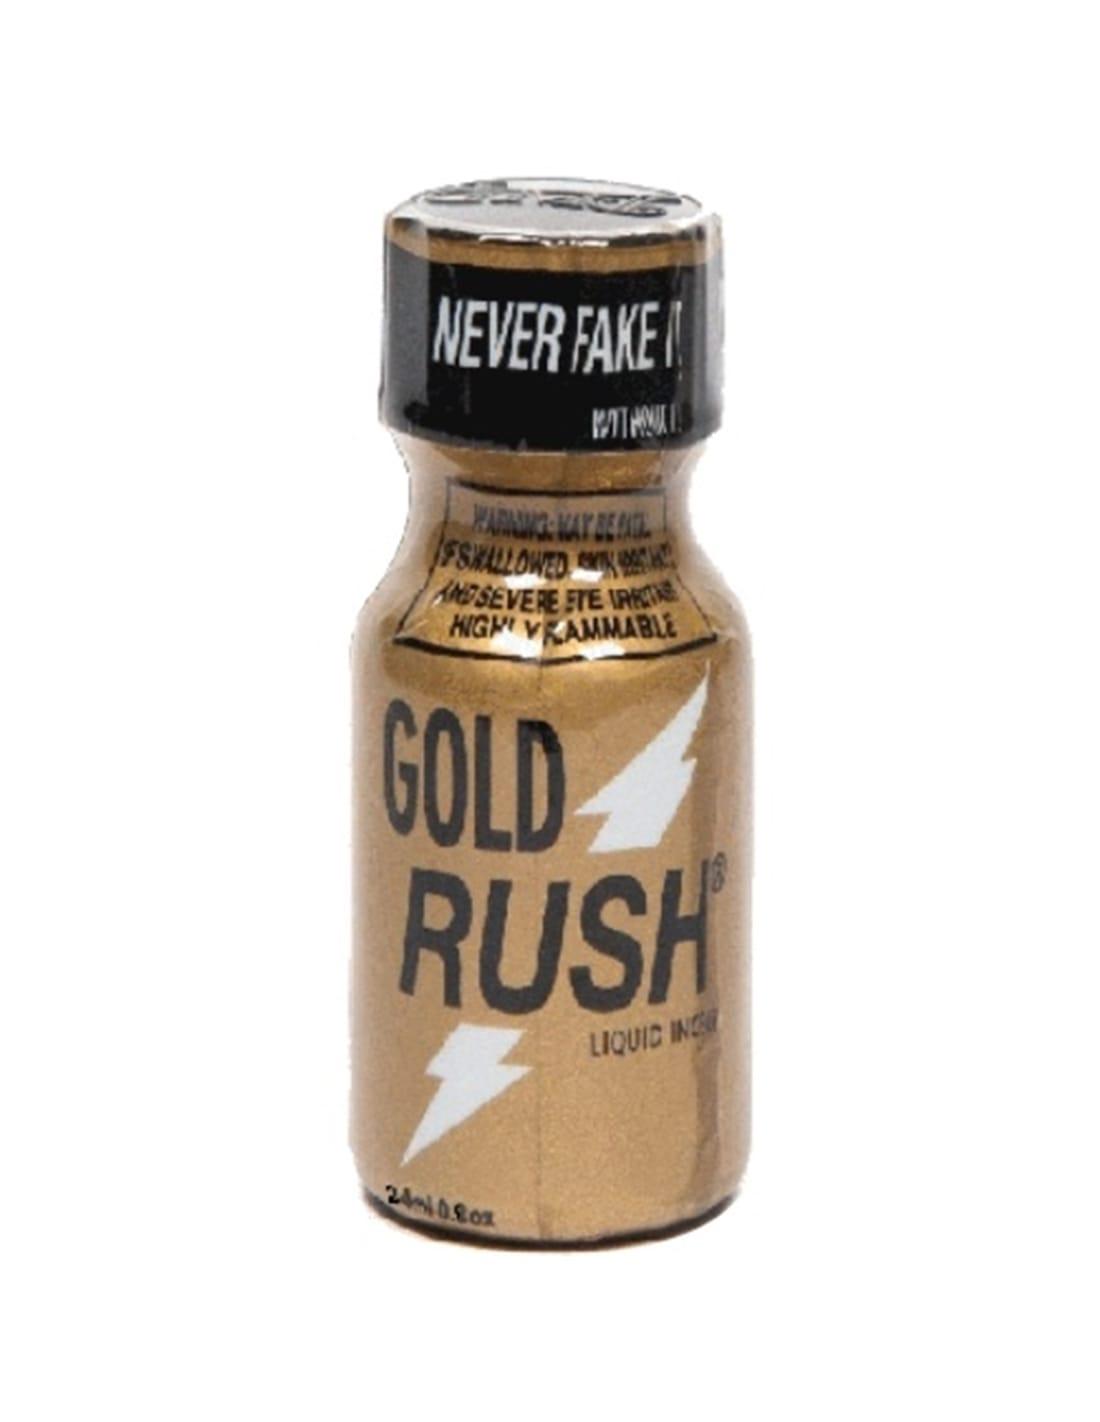 Gold Rush - PR2010319736